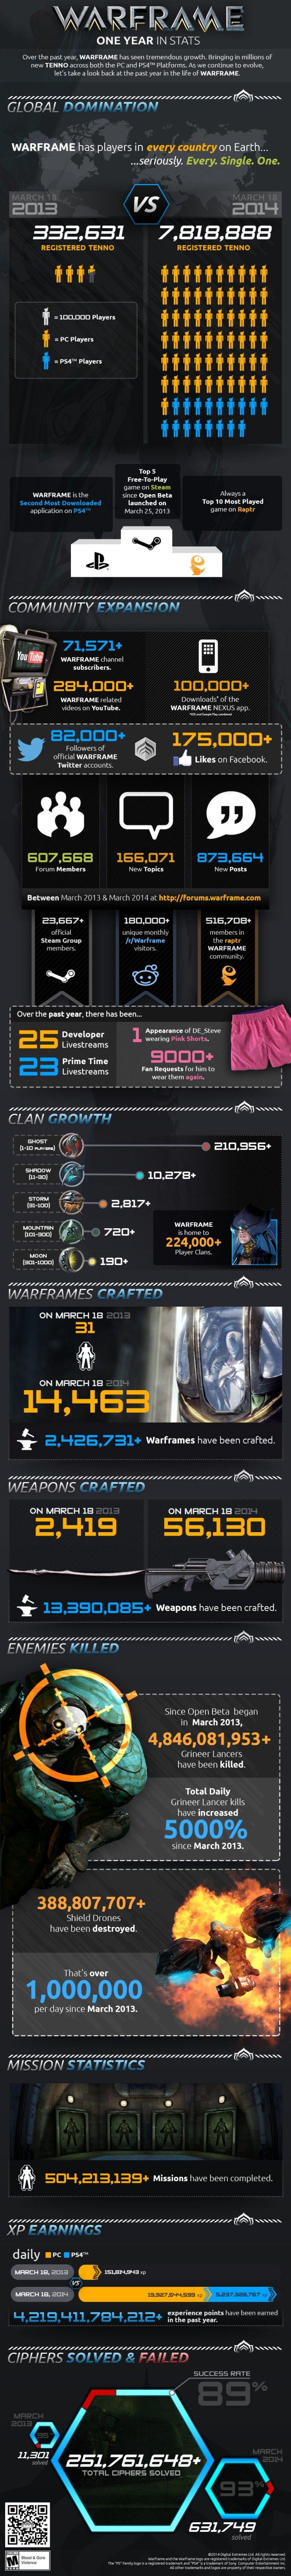 Warframe_Info-Grafik